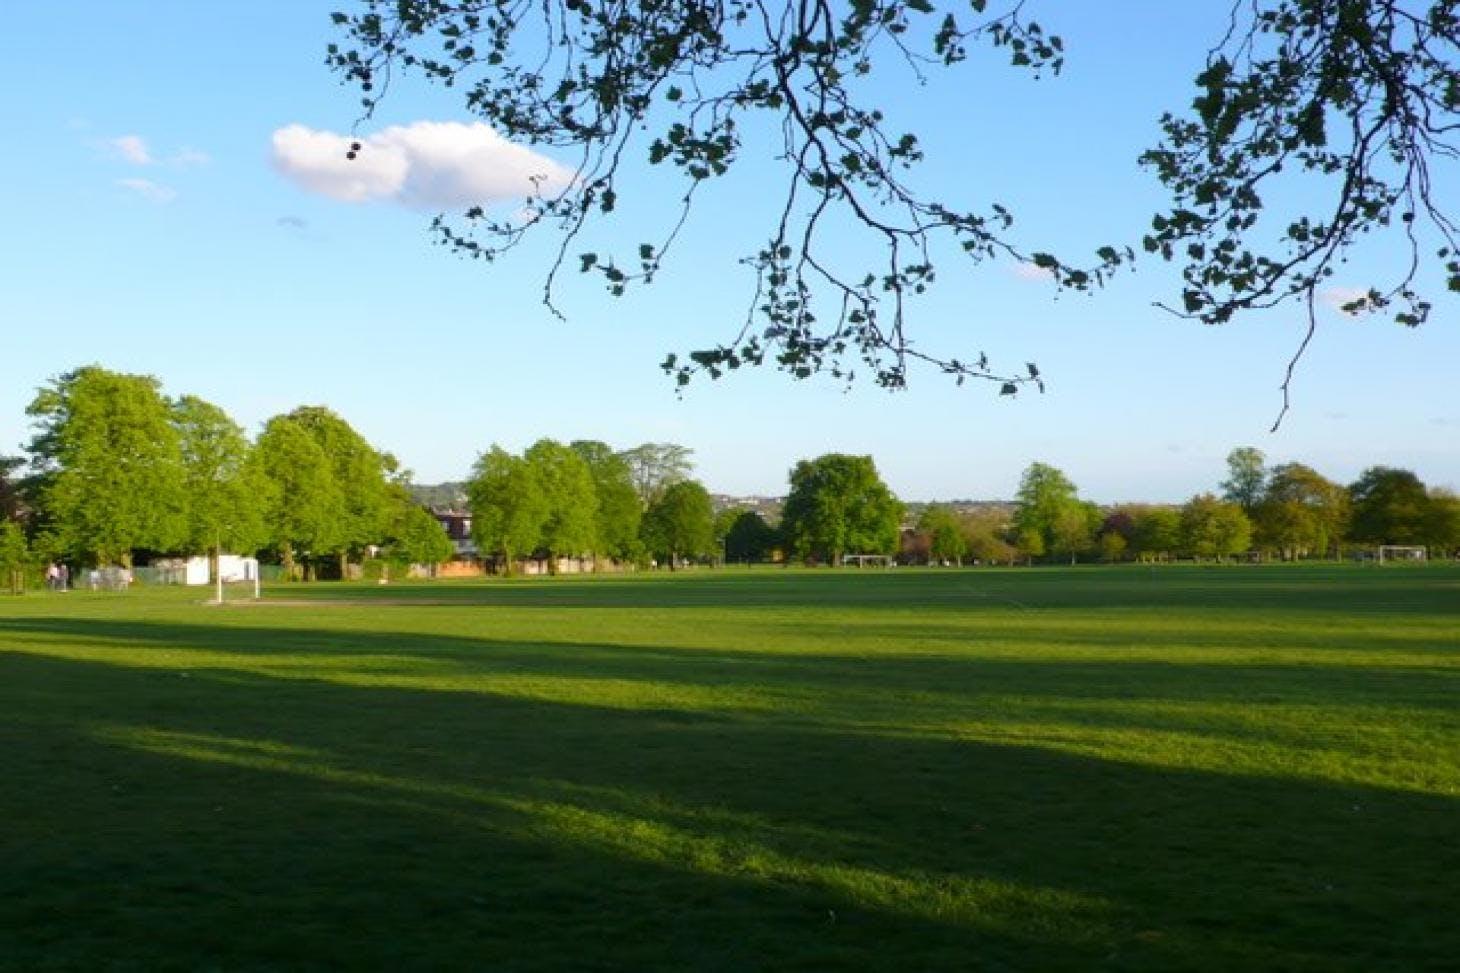 Hendon Park 5 a side | Grass football pitch